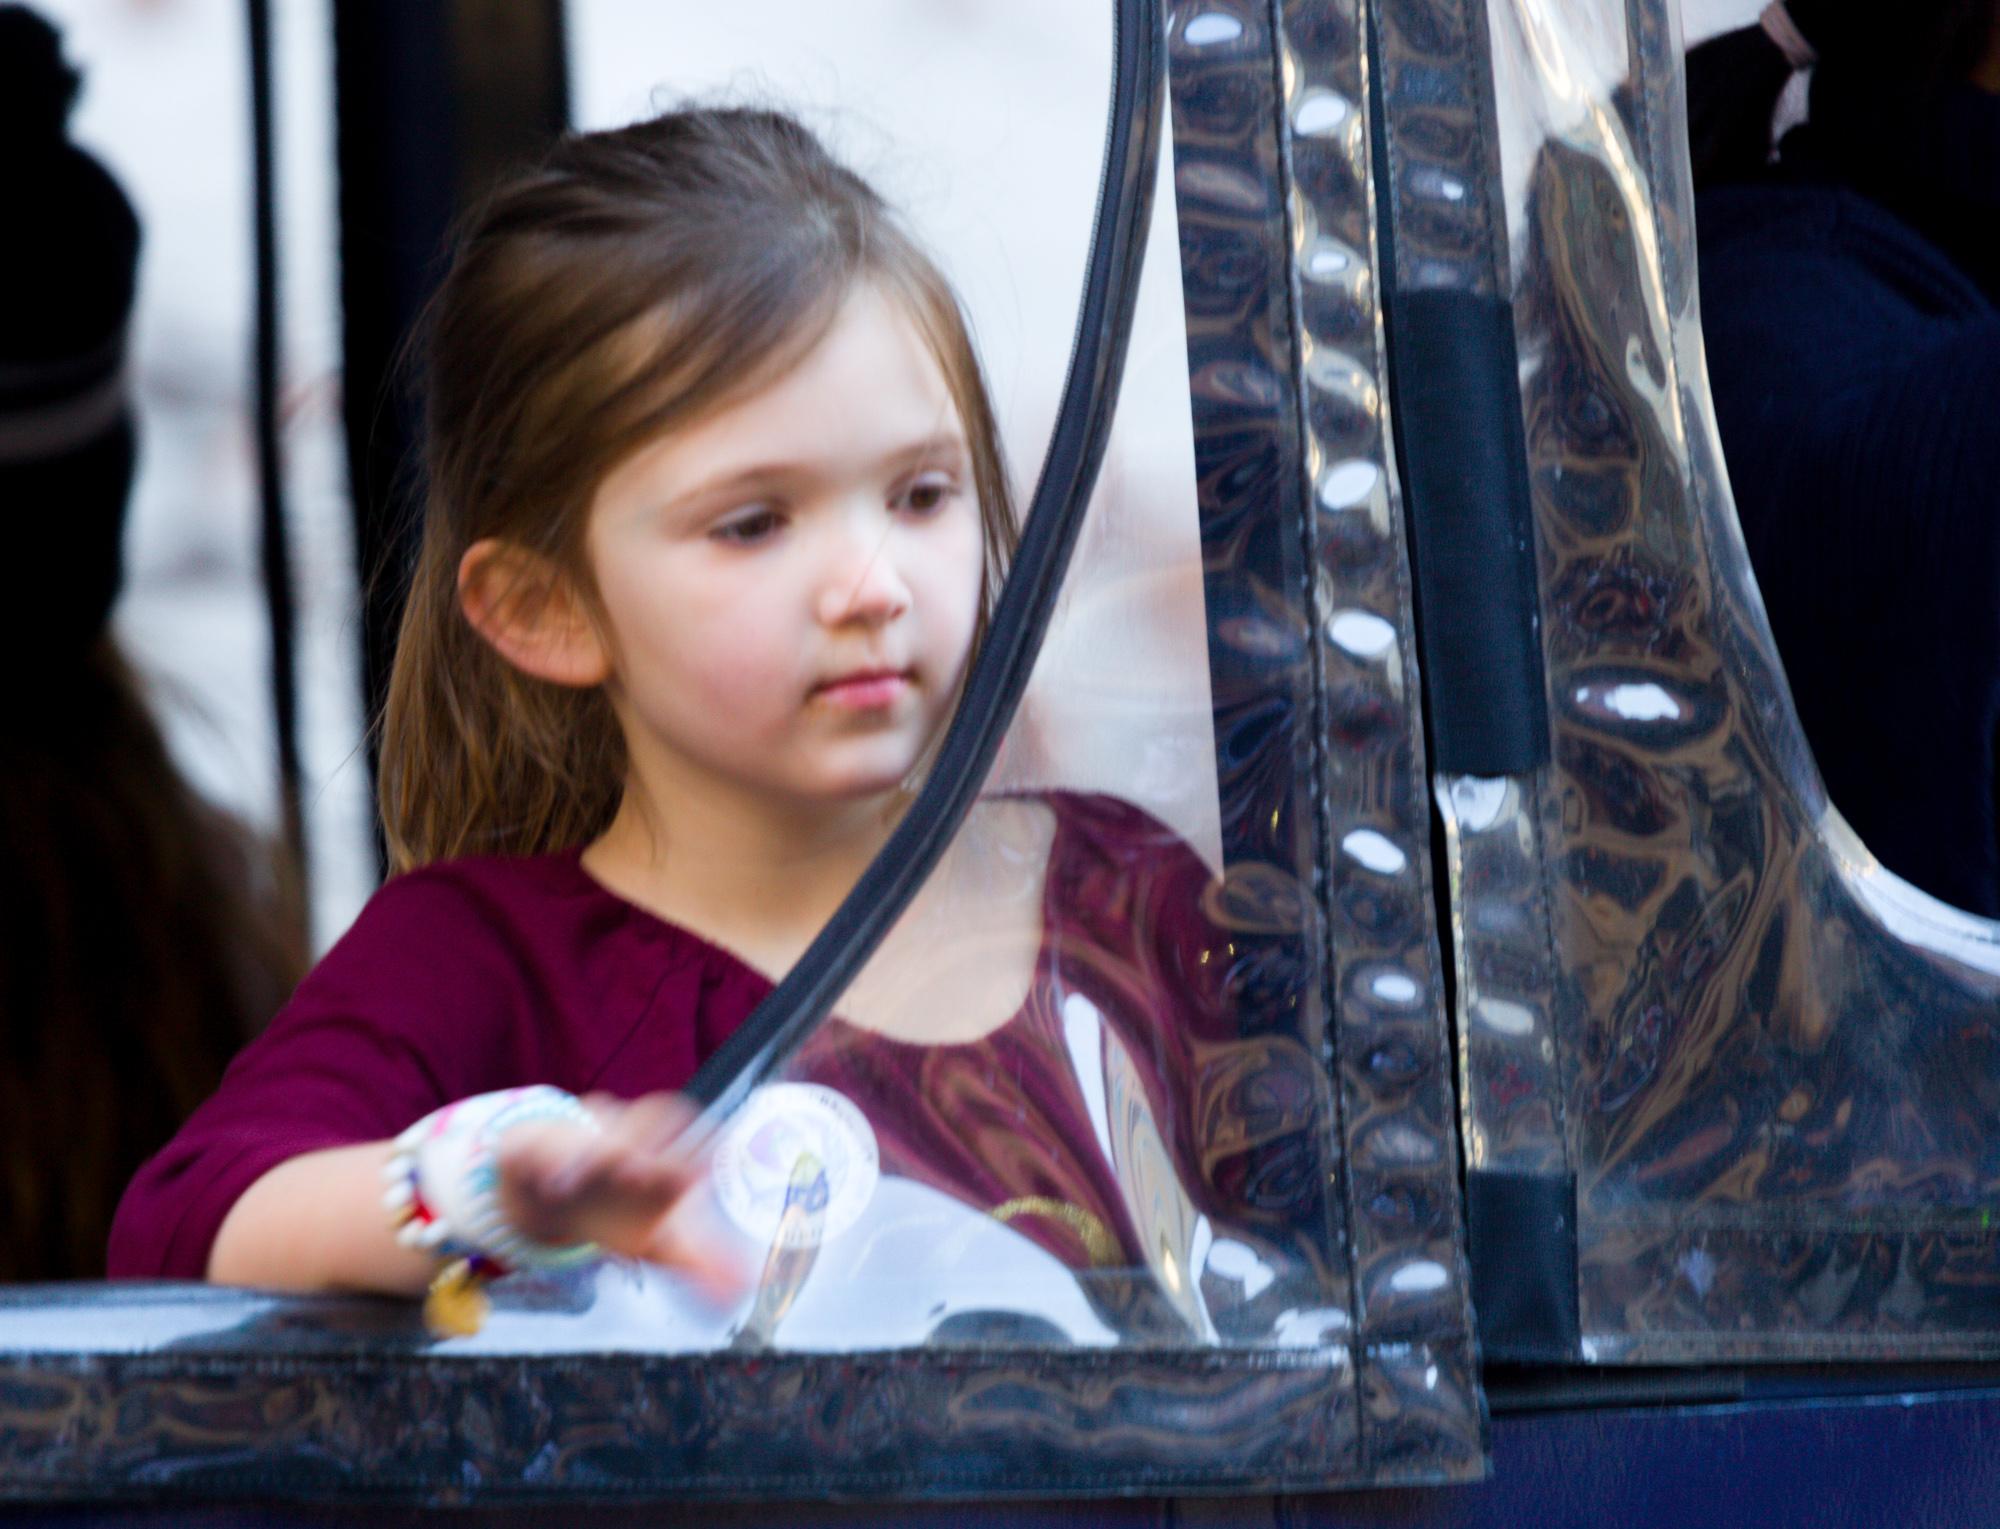 The girl in the acetate window